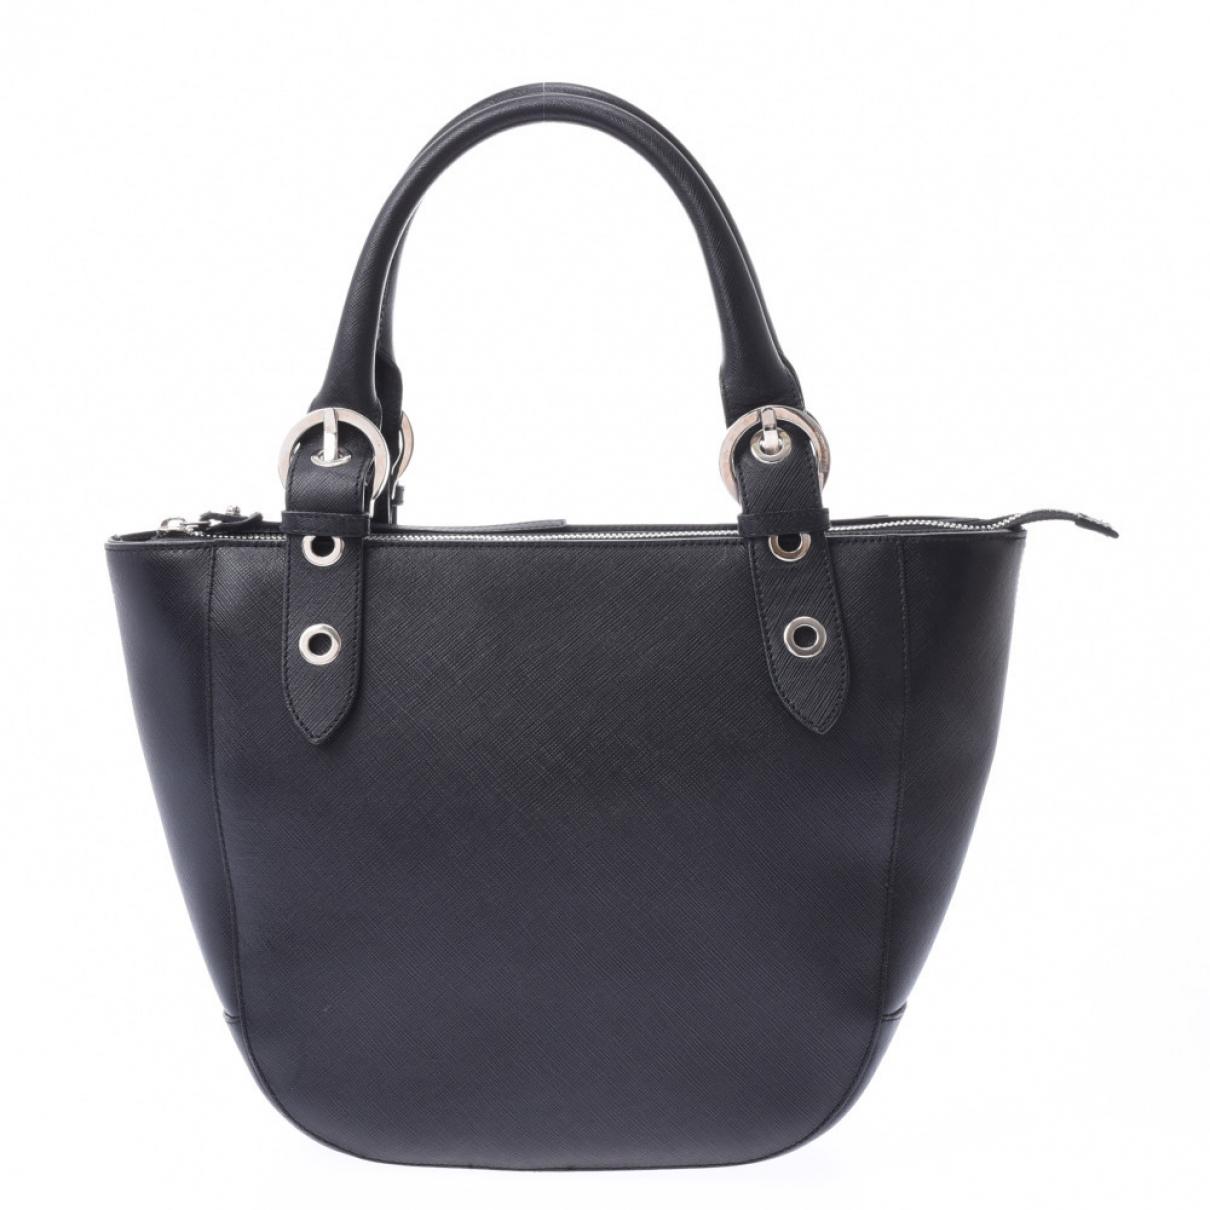 Salvatore Ferragamo \N Black Cloth handbag for Women \N